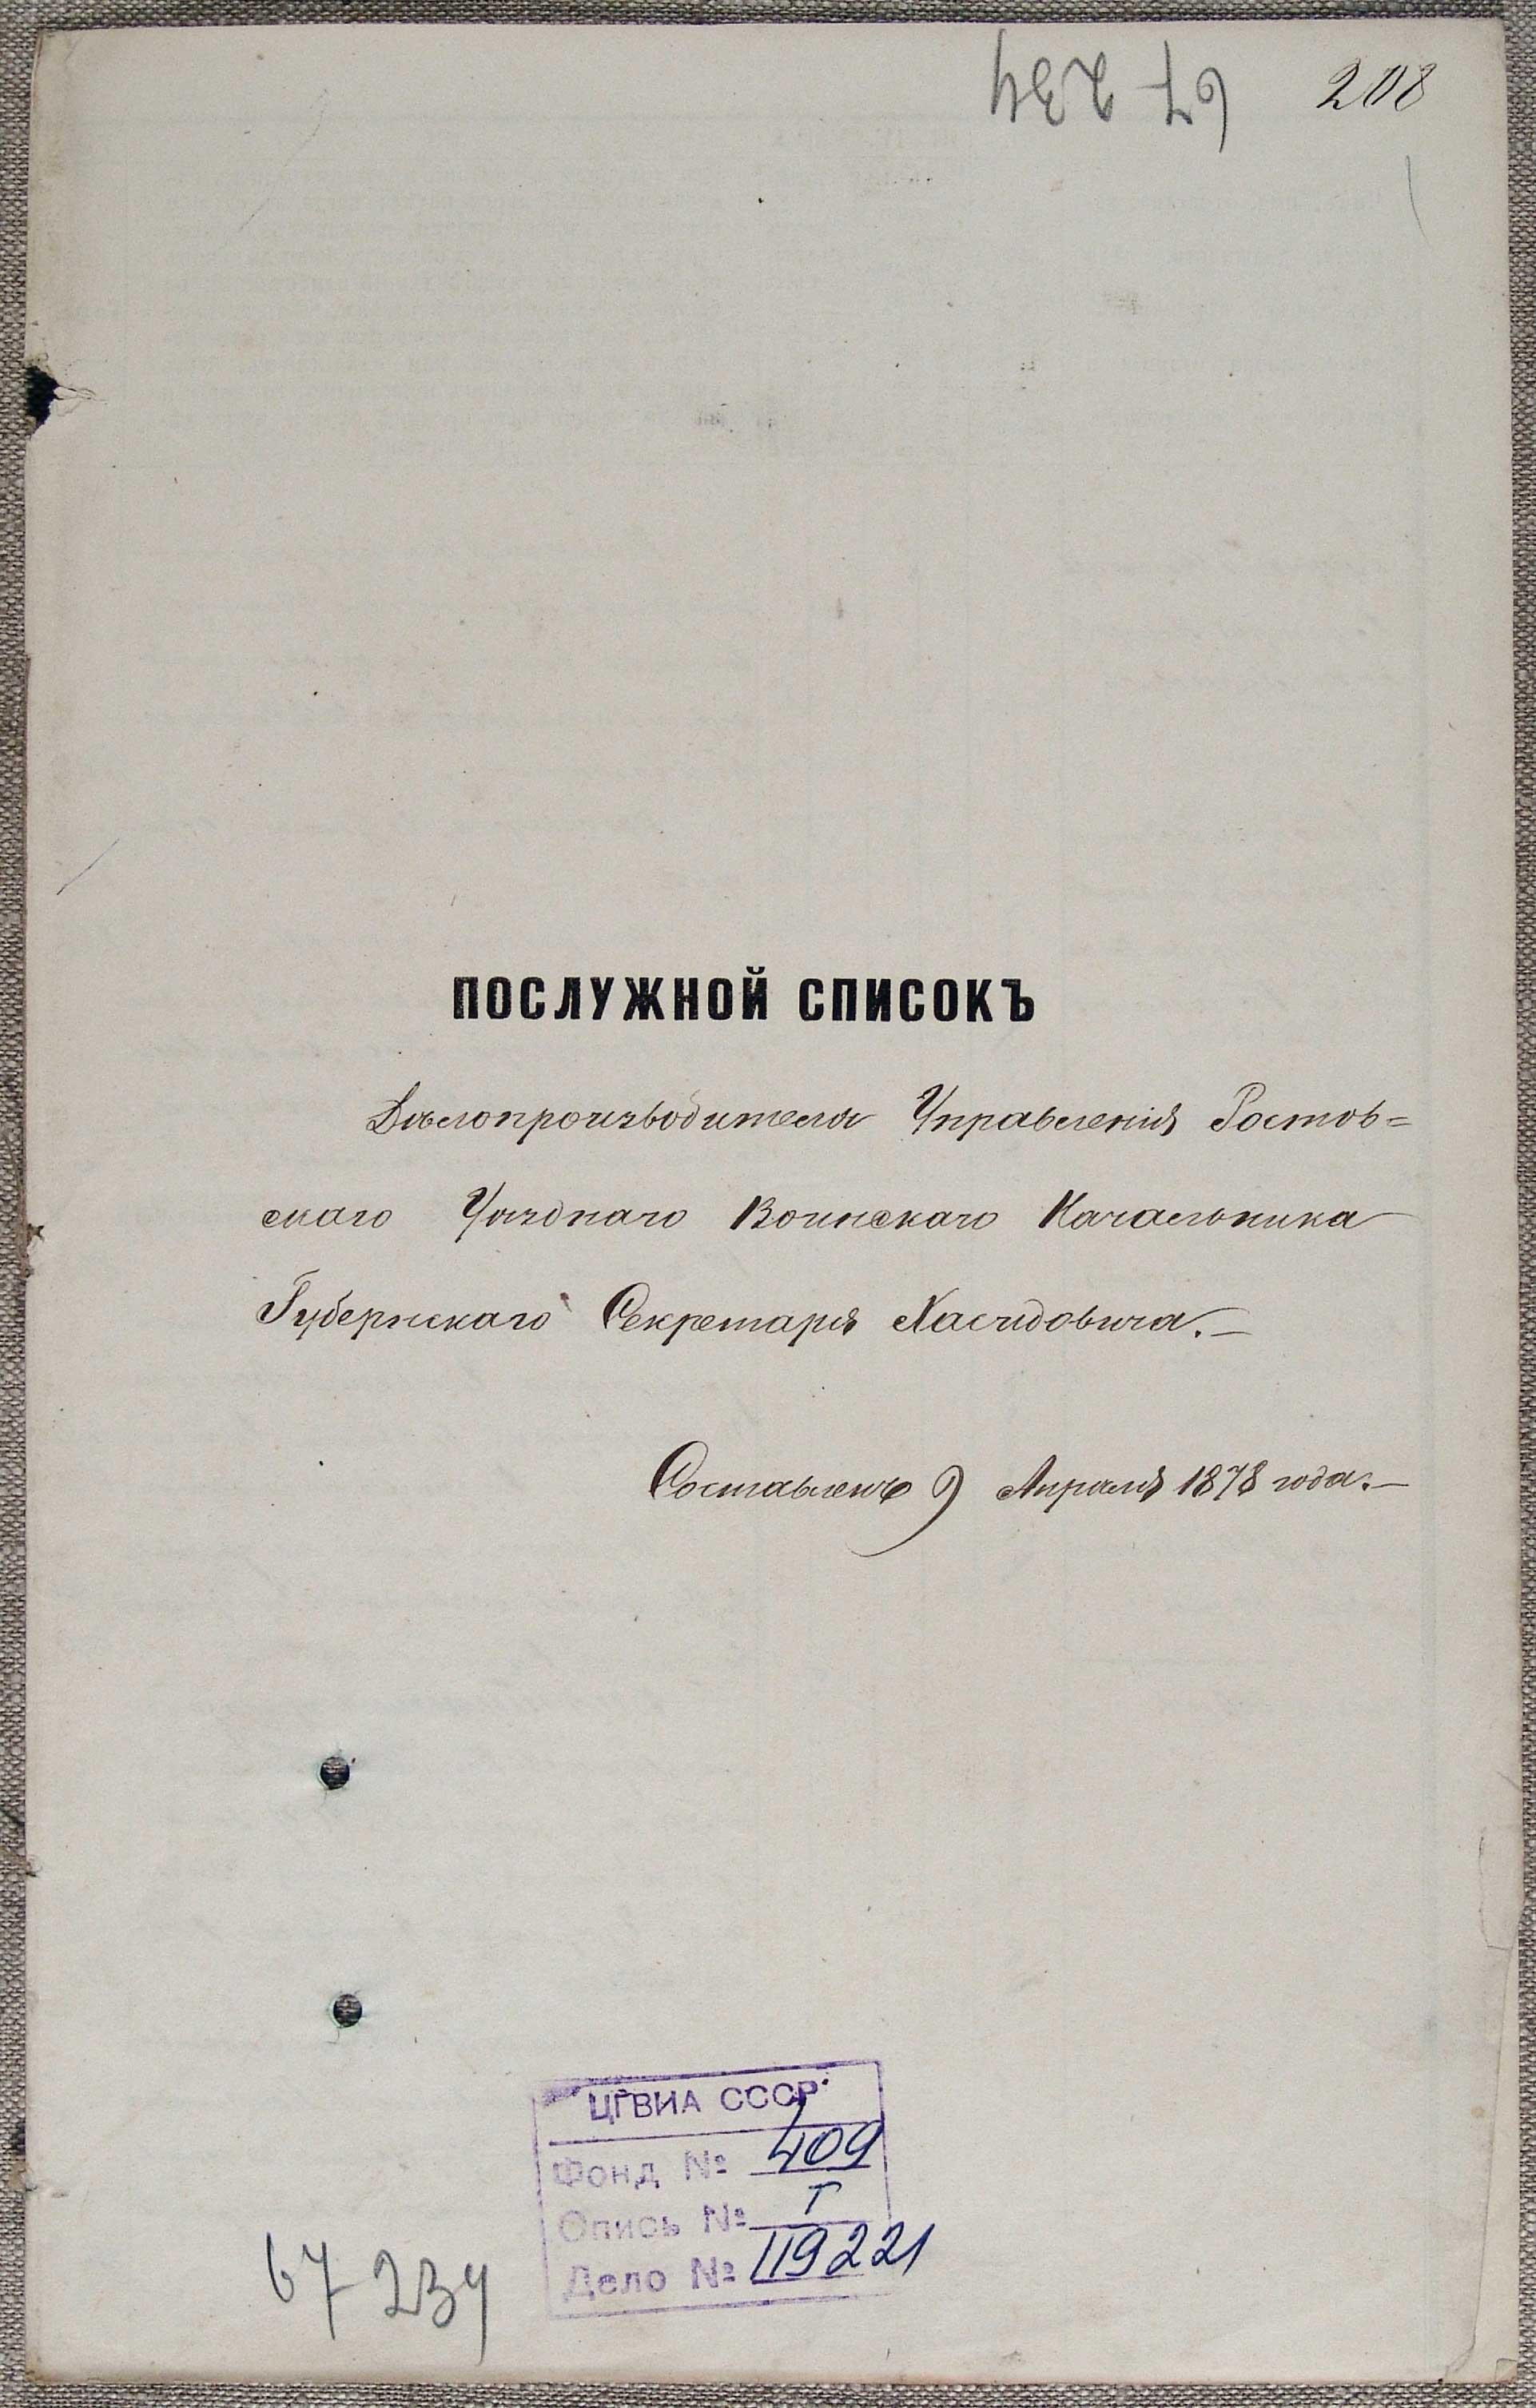 Photo: Хасидович Дмитрий Петрович. Послужной список